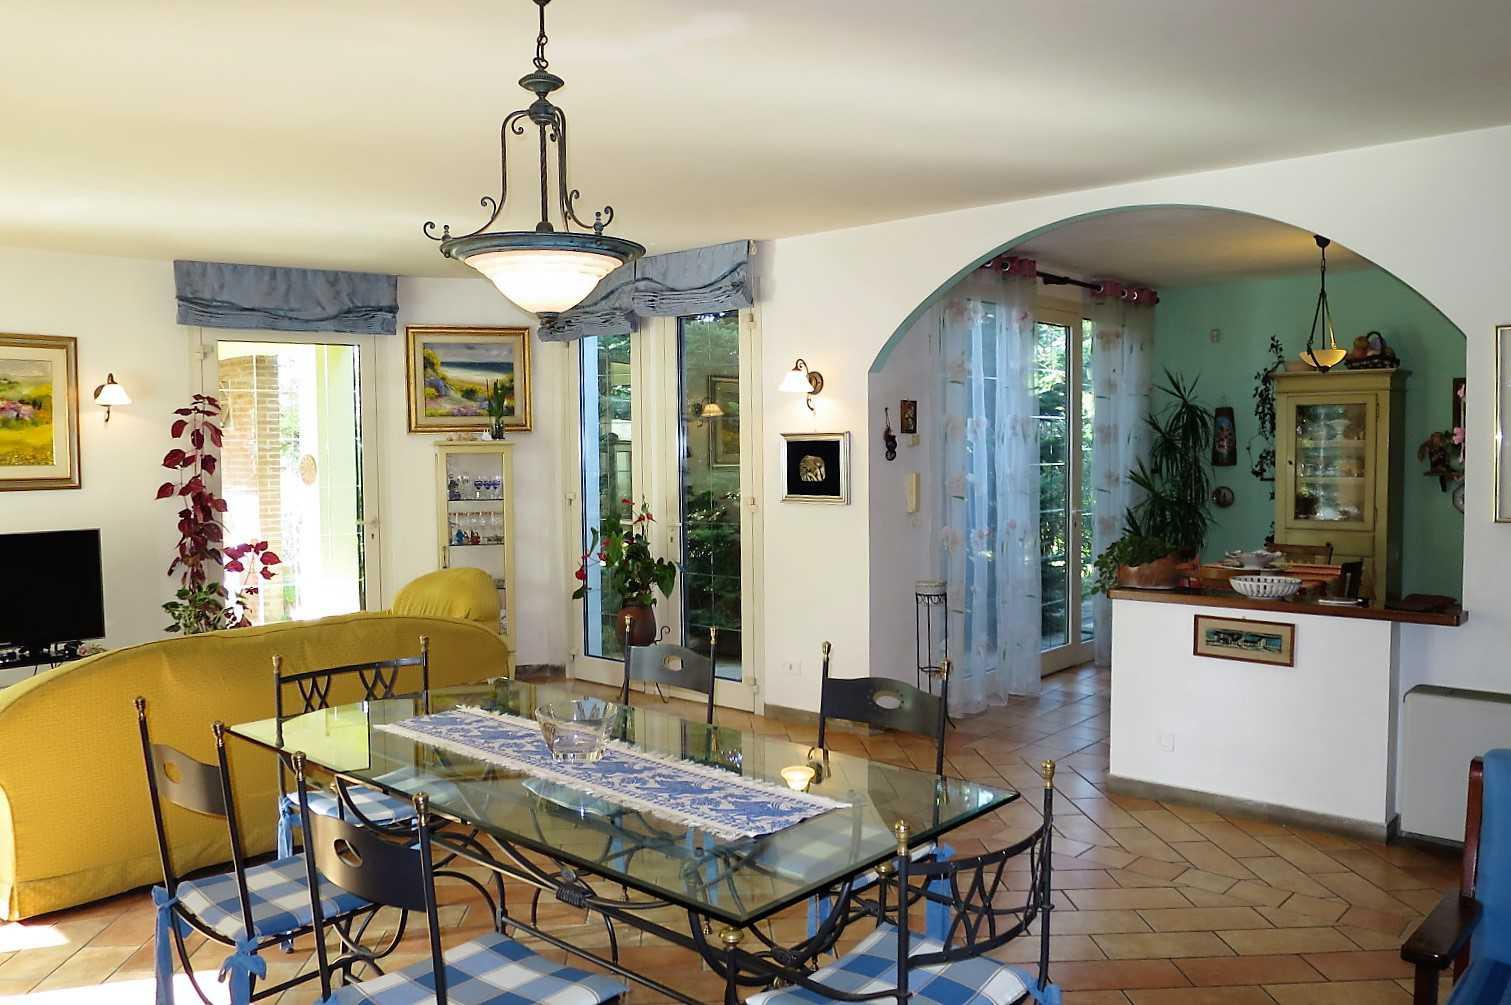 Villa Villa in vendita Atri (TE), Villa Paola - Atri - EUR 471.071 120